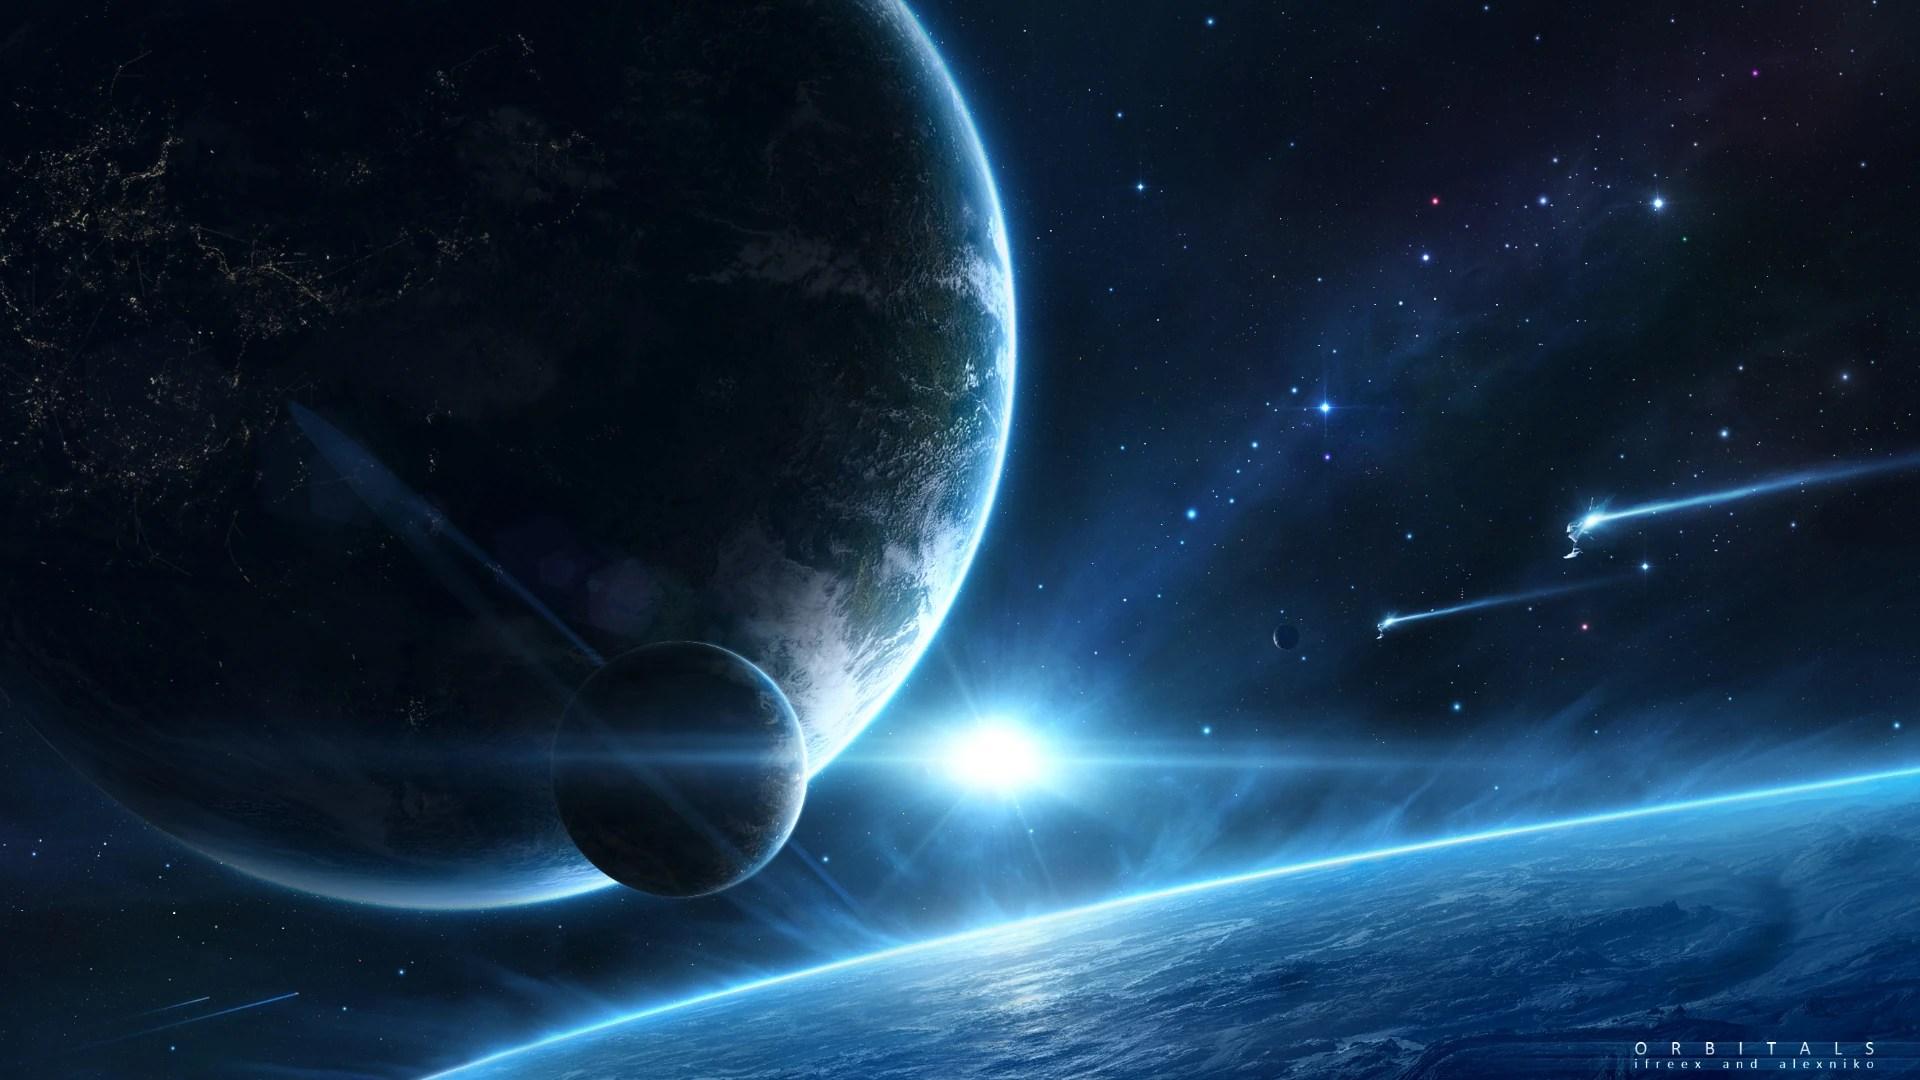 Image - Space Fantasy HD Wallpaper-34 jpg Orbitals 1920x1080.jpg   Sci Fi Mini Builders Wiki ...